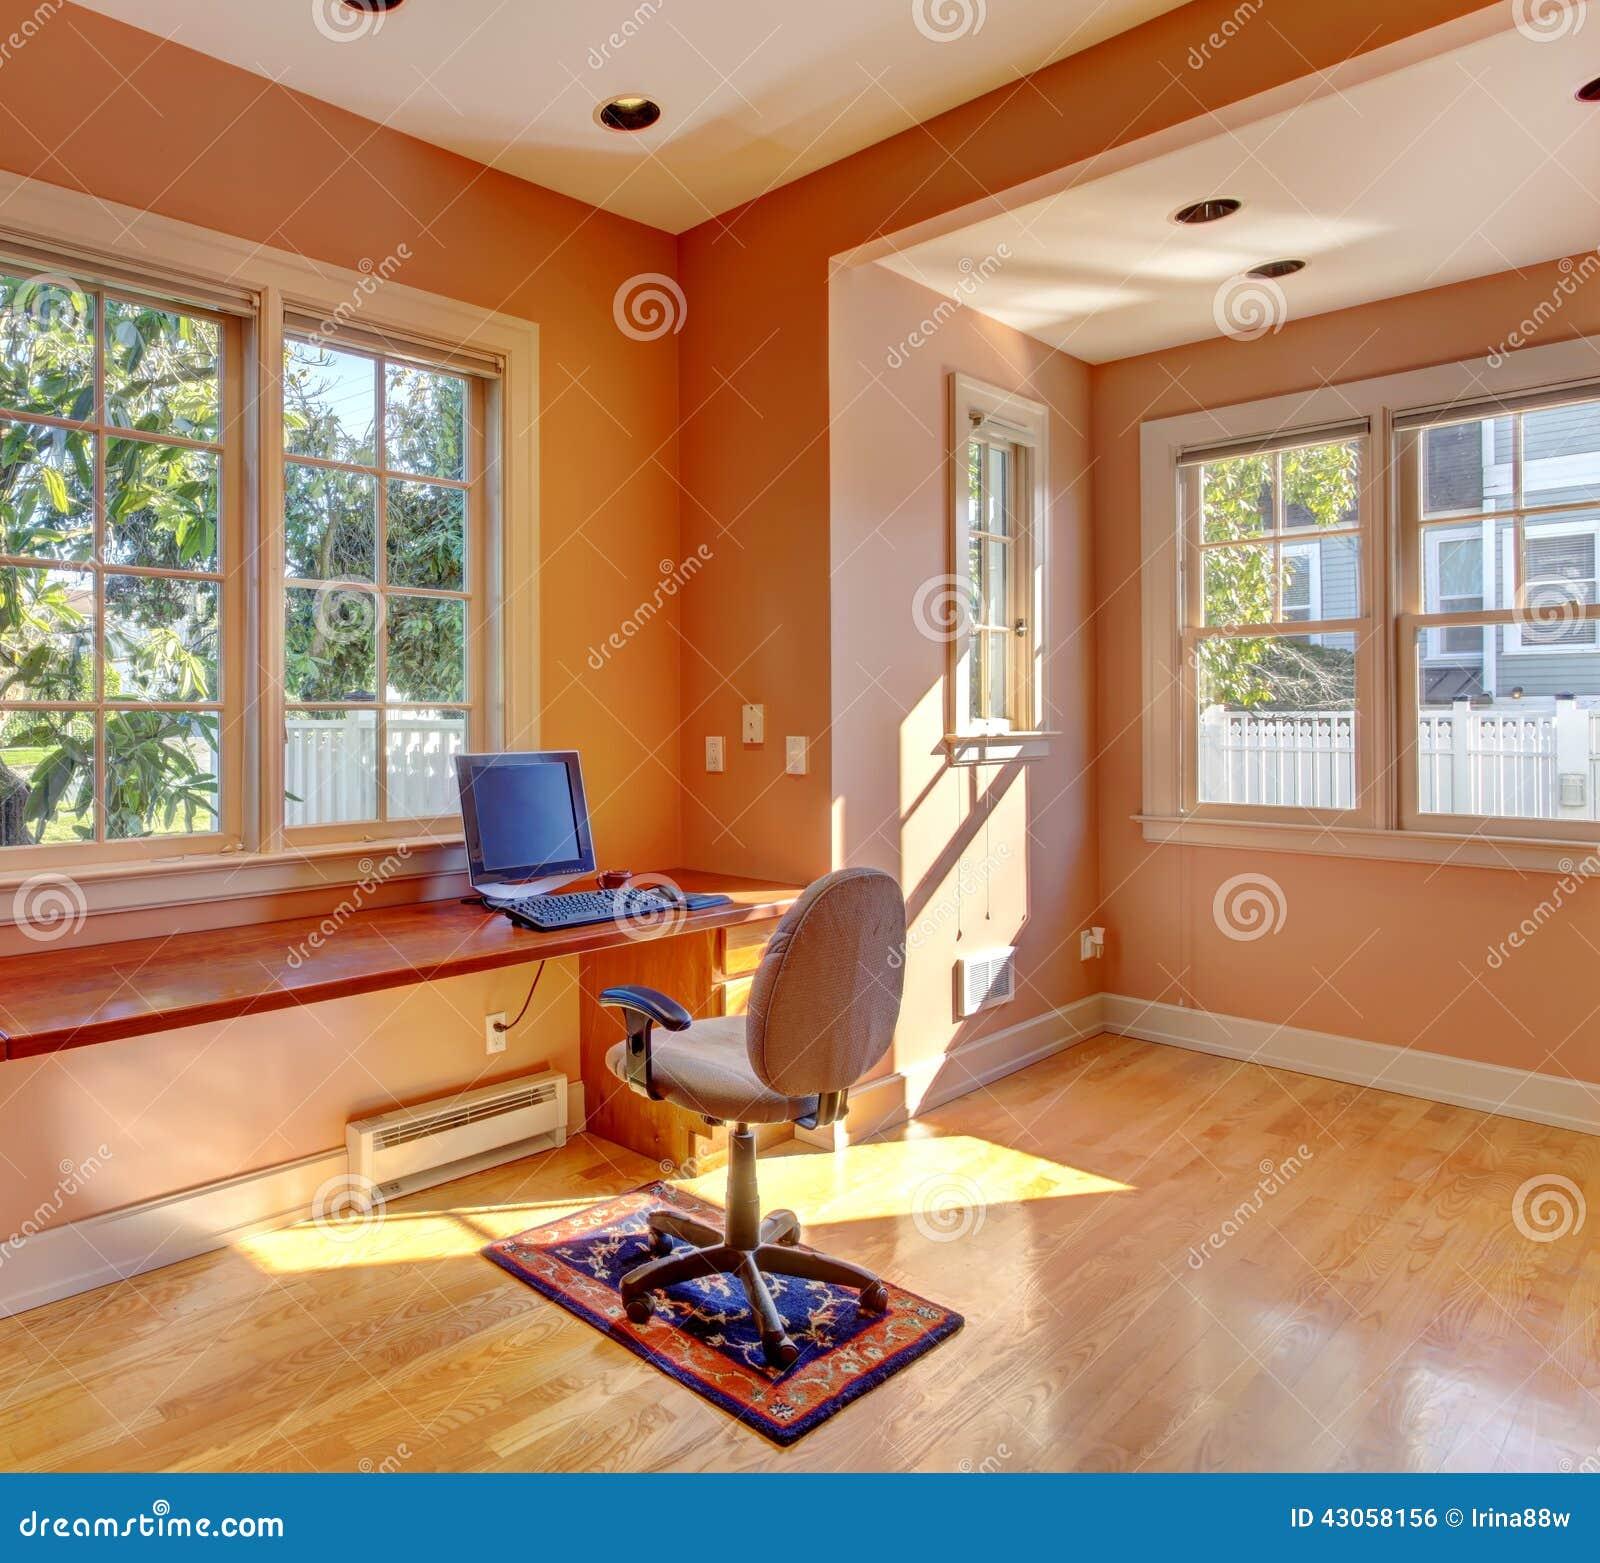 office room interior in peach color bright office room interior